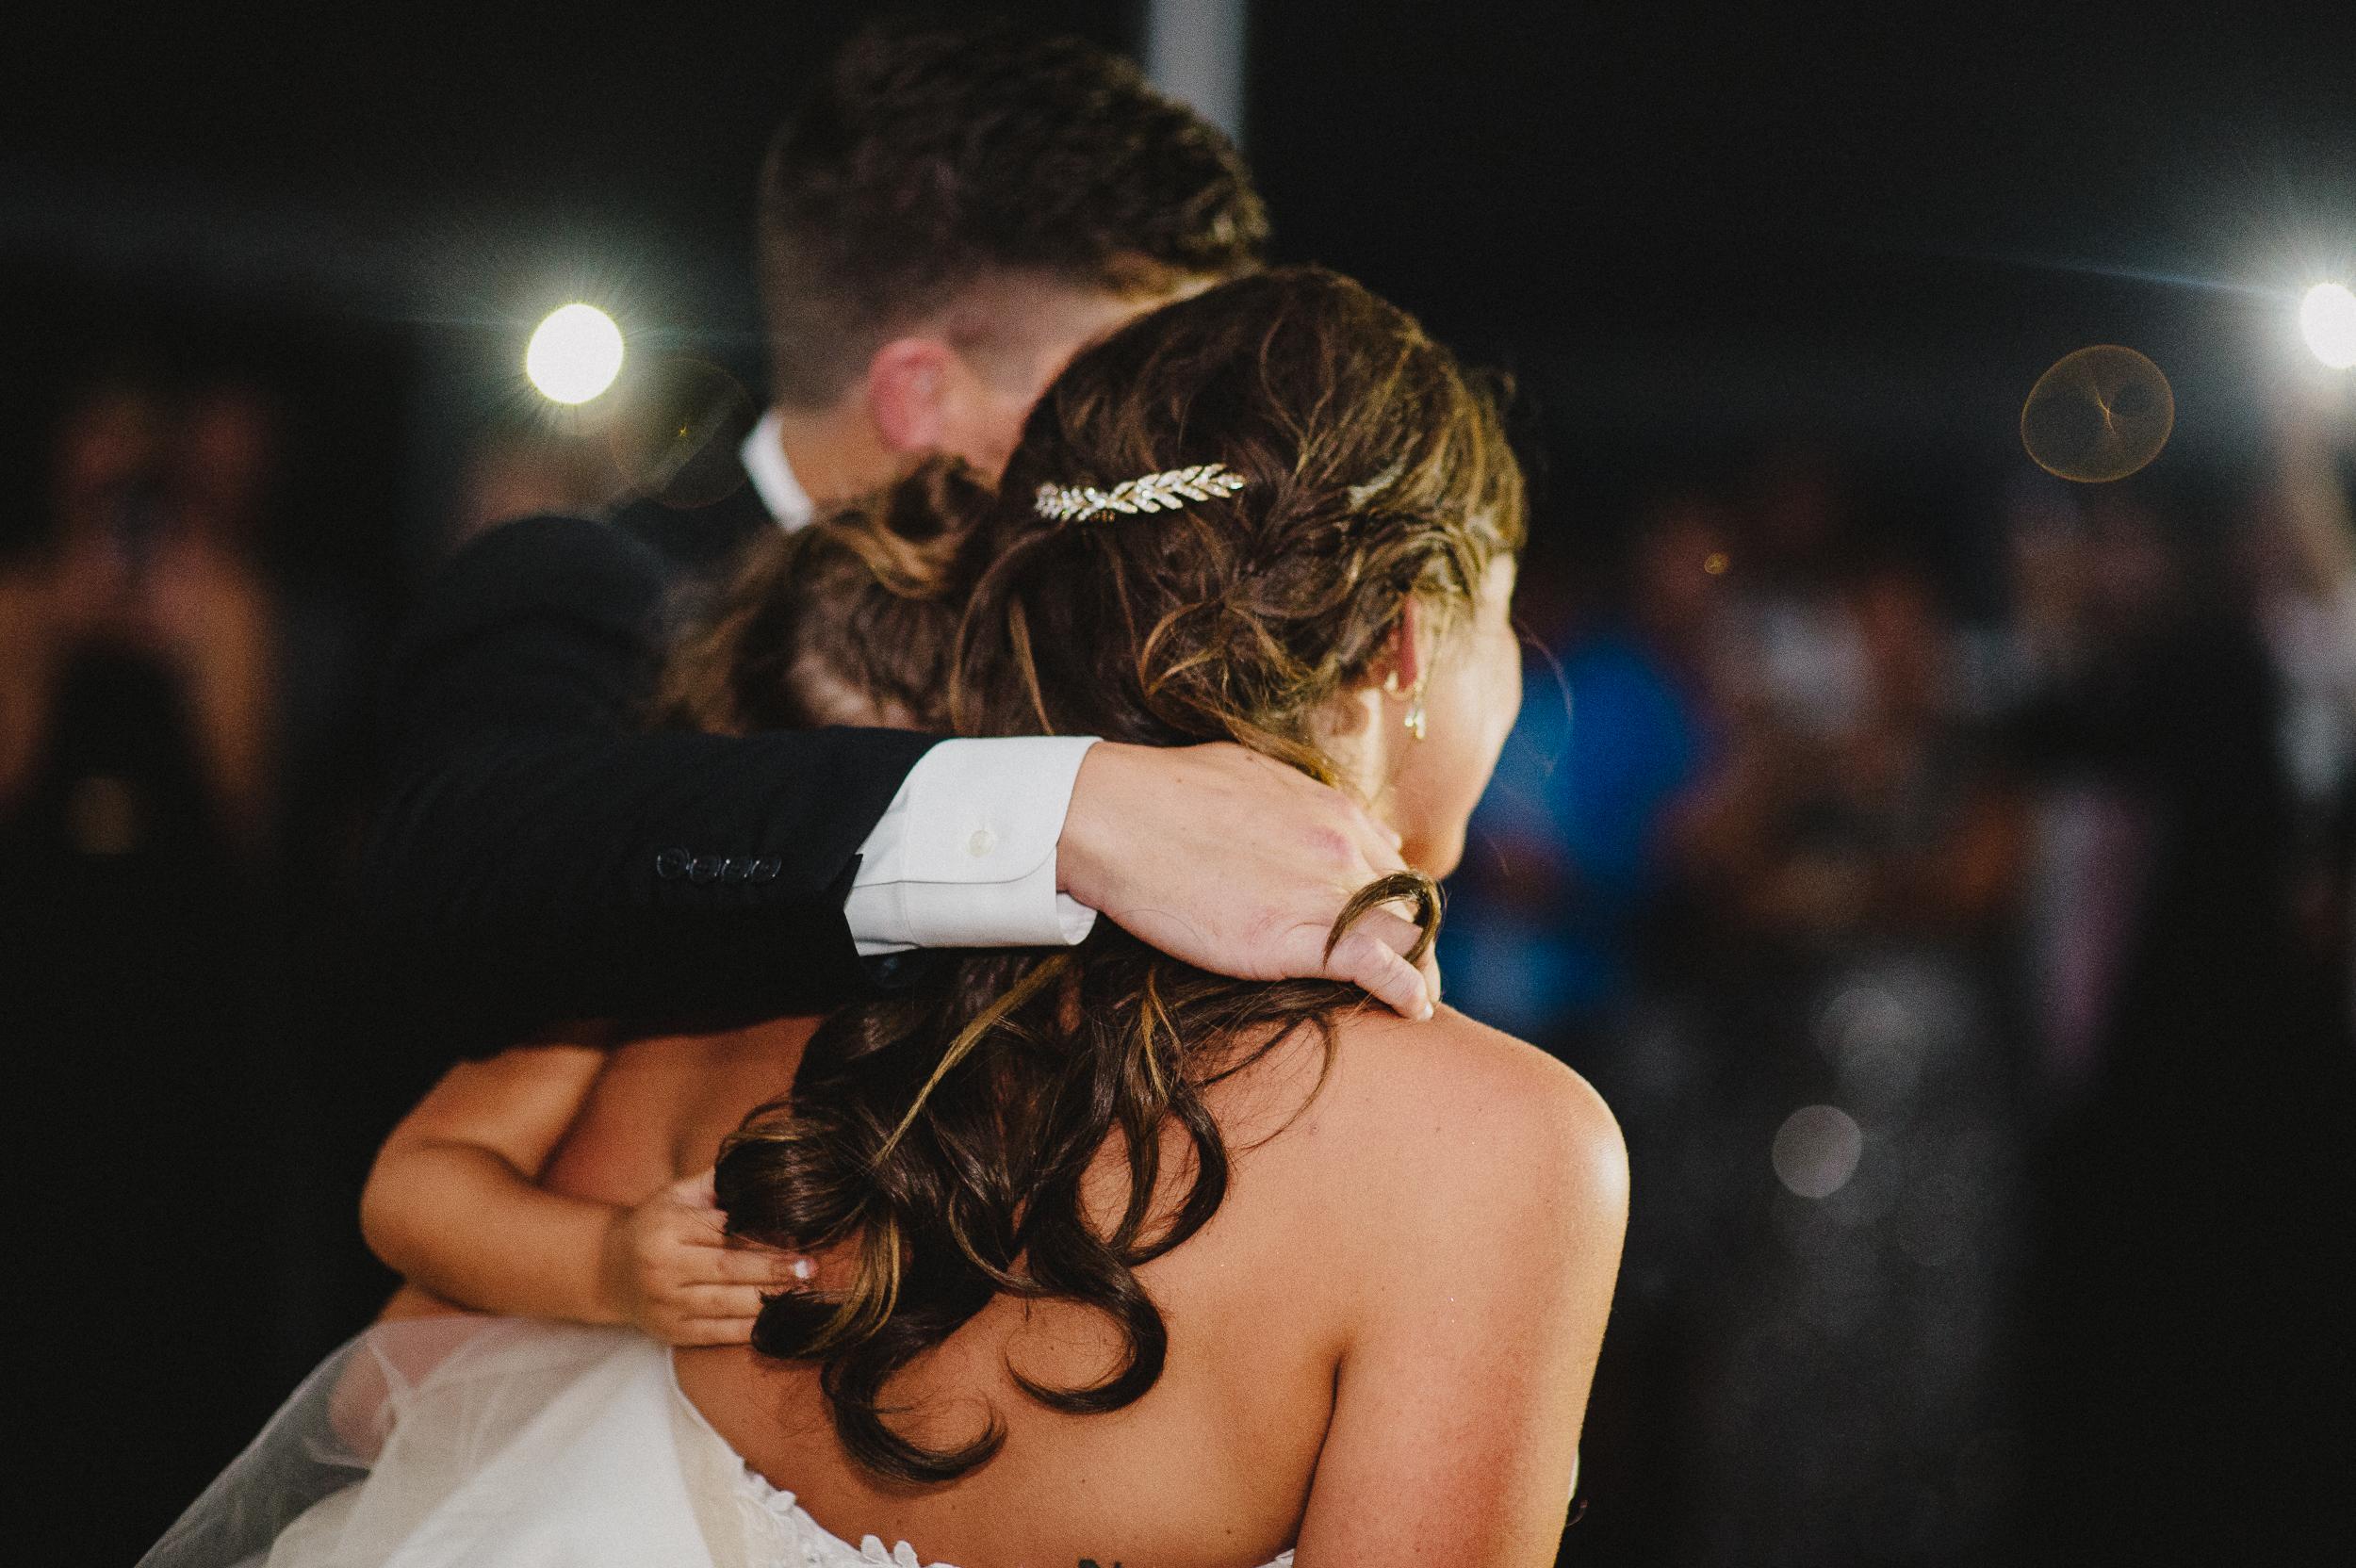 delaware-estate-wedding-photographer-pat-robinson-photography-107.jpg